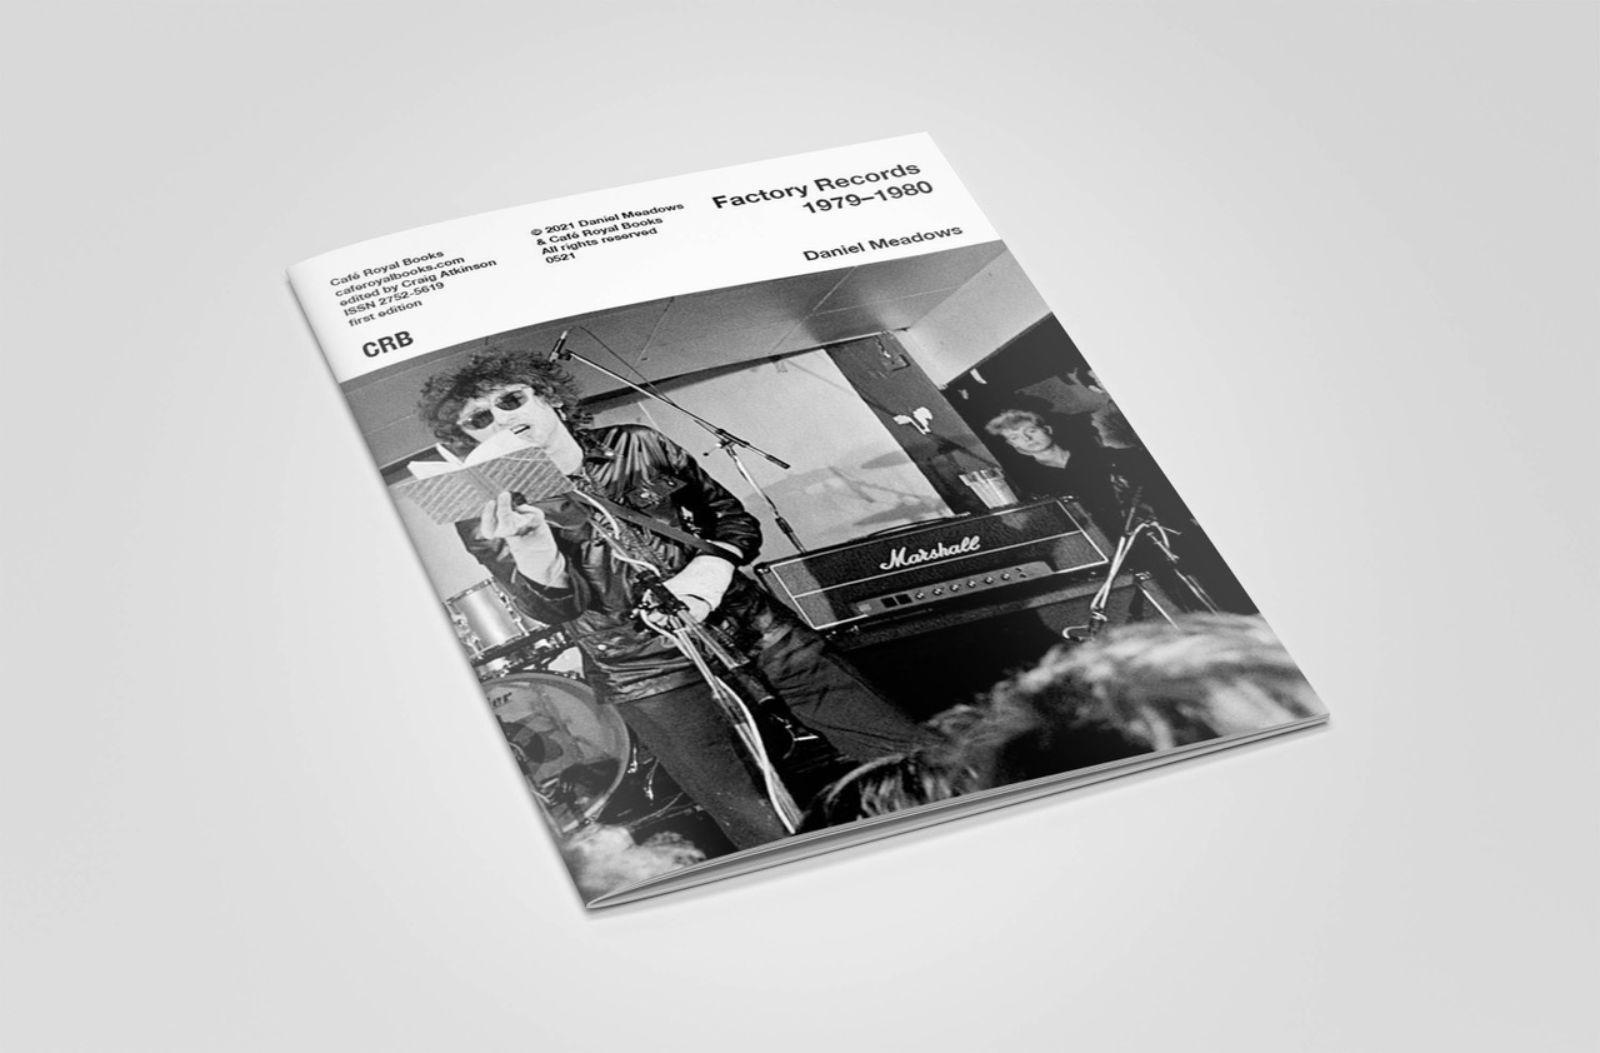 Daniel Meadows - Factory Records 1979-1980